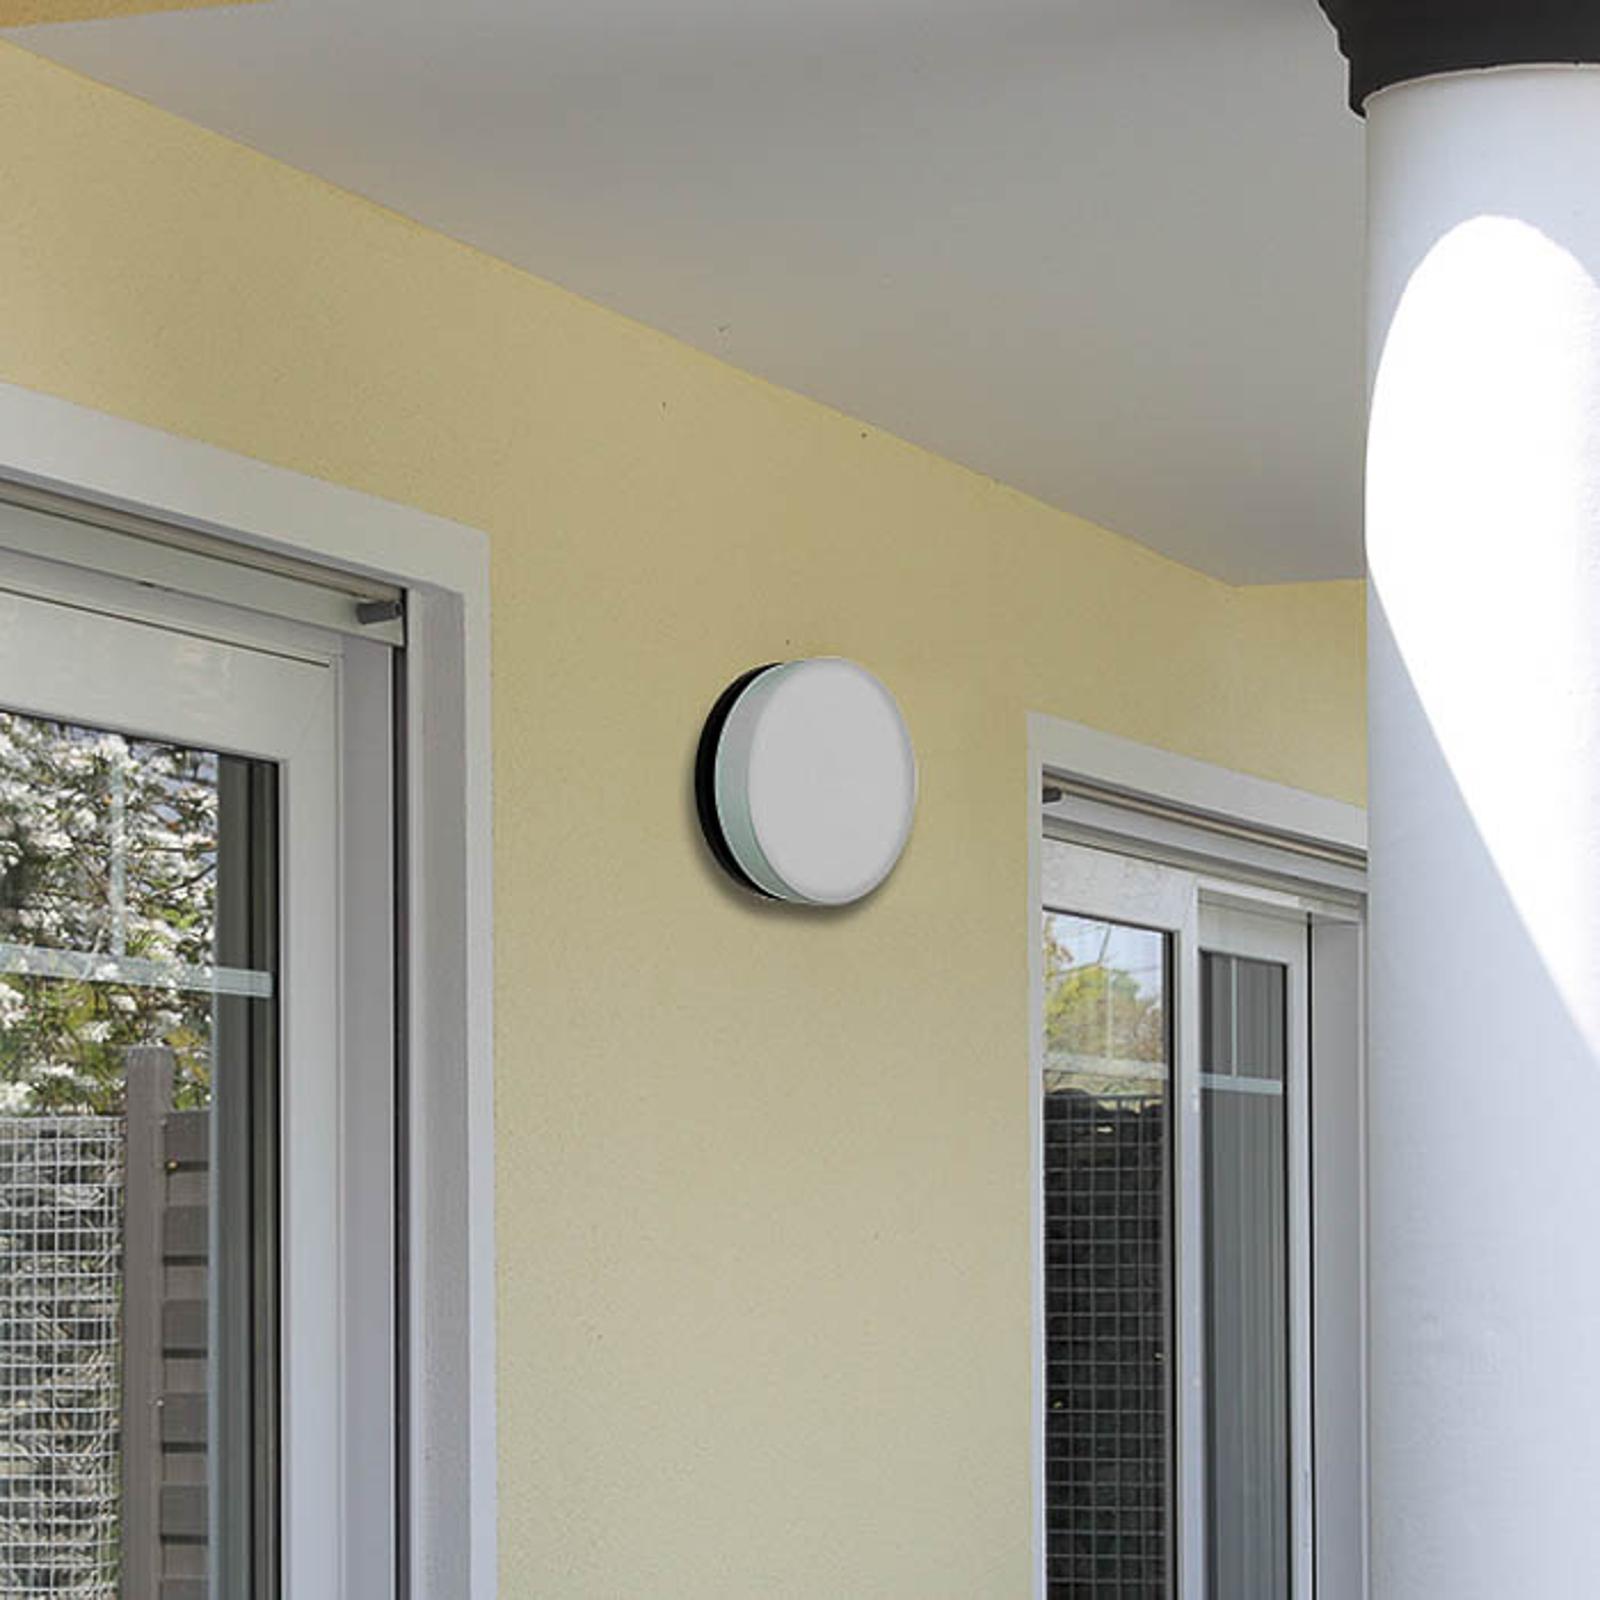 Applique LED 6308 anthracite, IP65, Ø 25cm